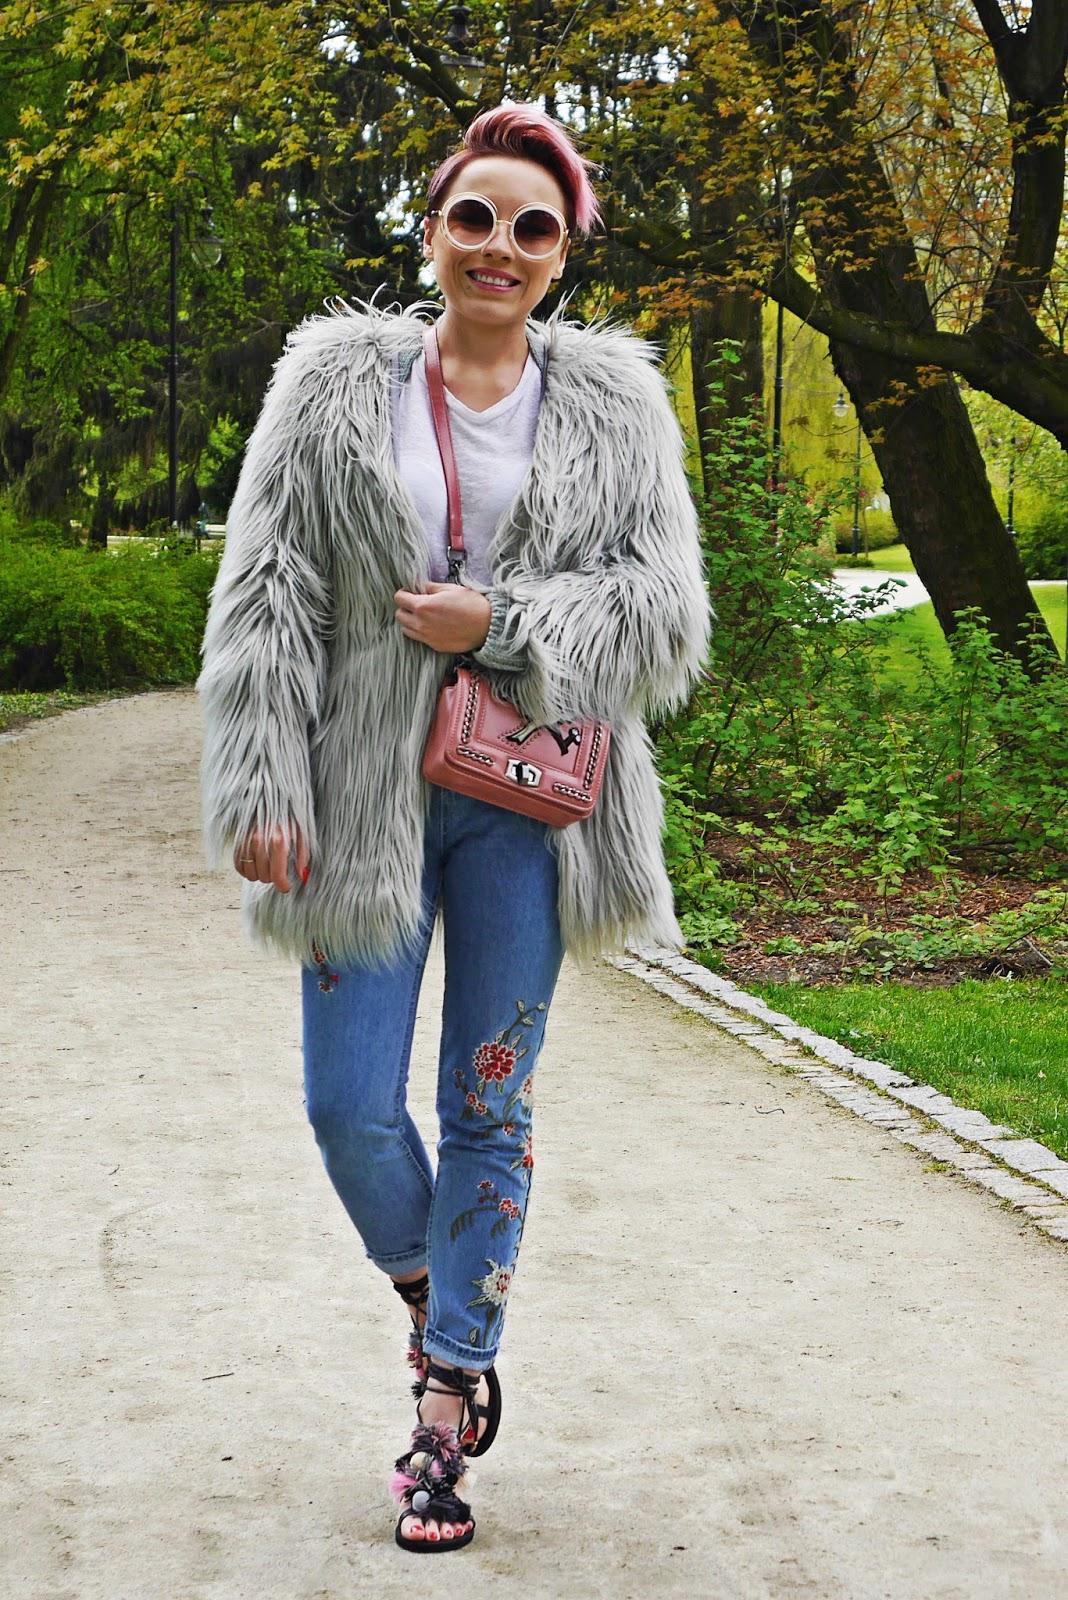 pompon_sandals_dresslily_ootd_look_karyn_blog_gray_fur_mama_jeans_020517a